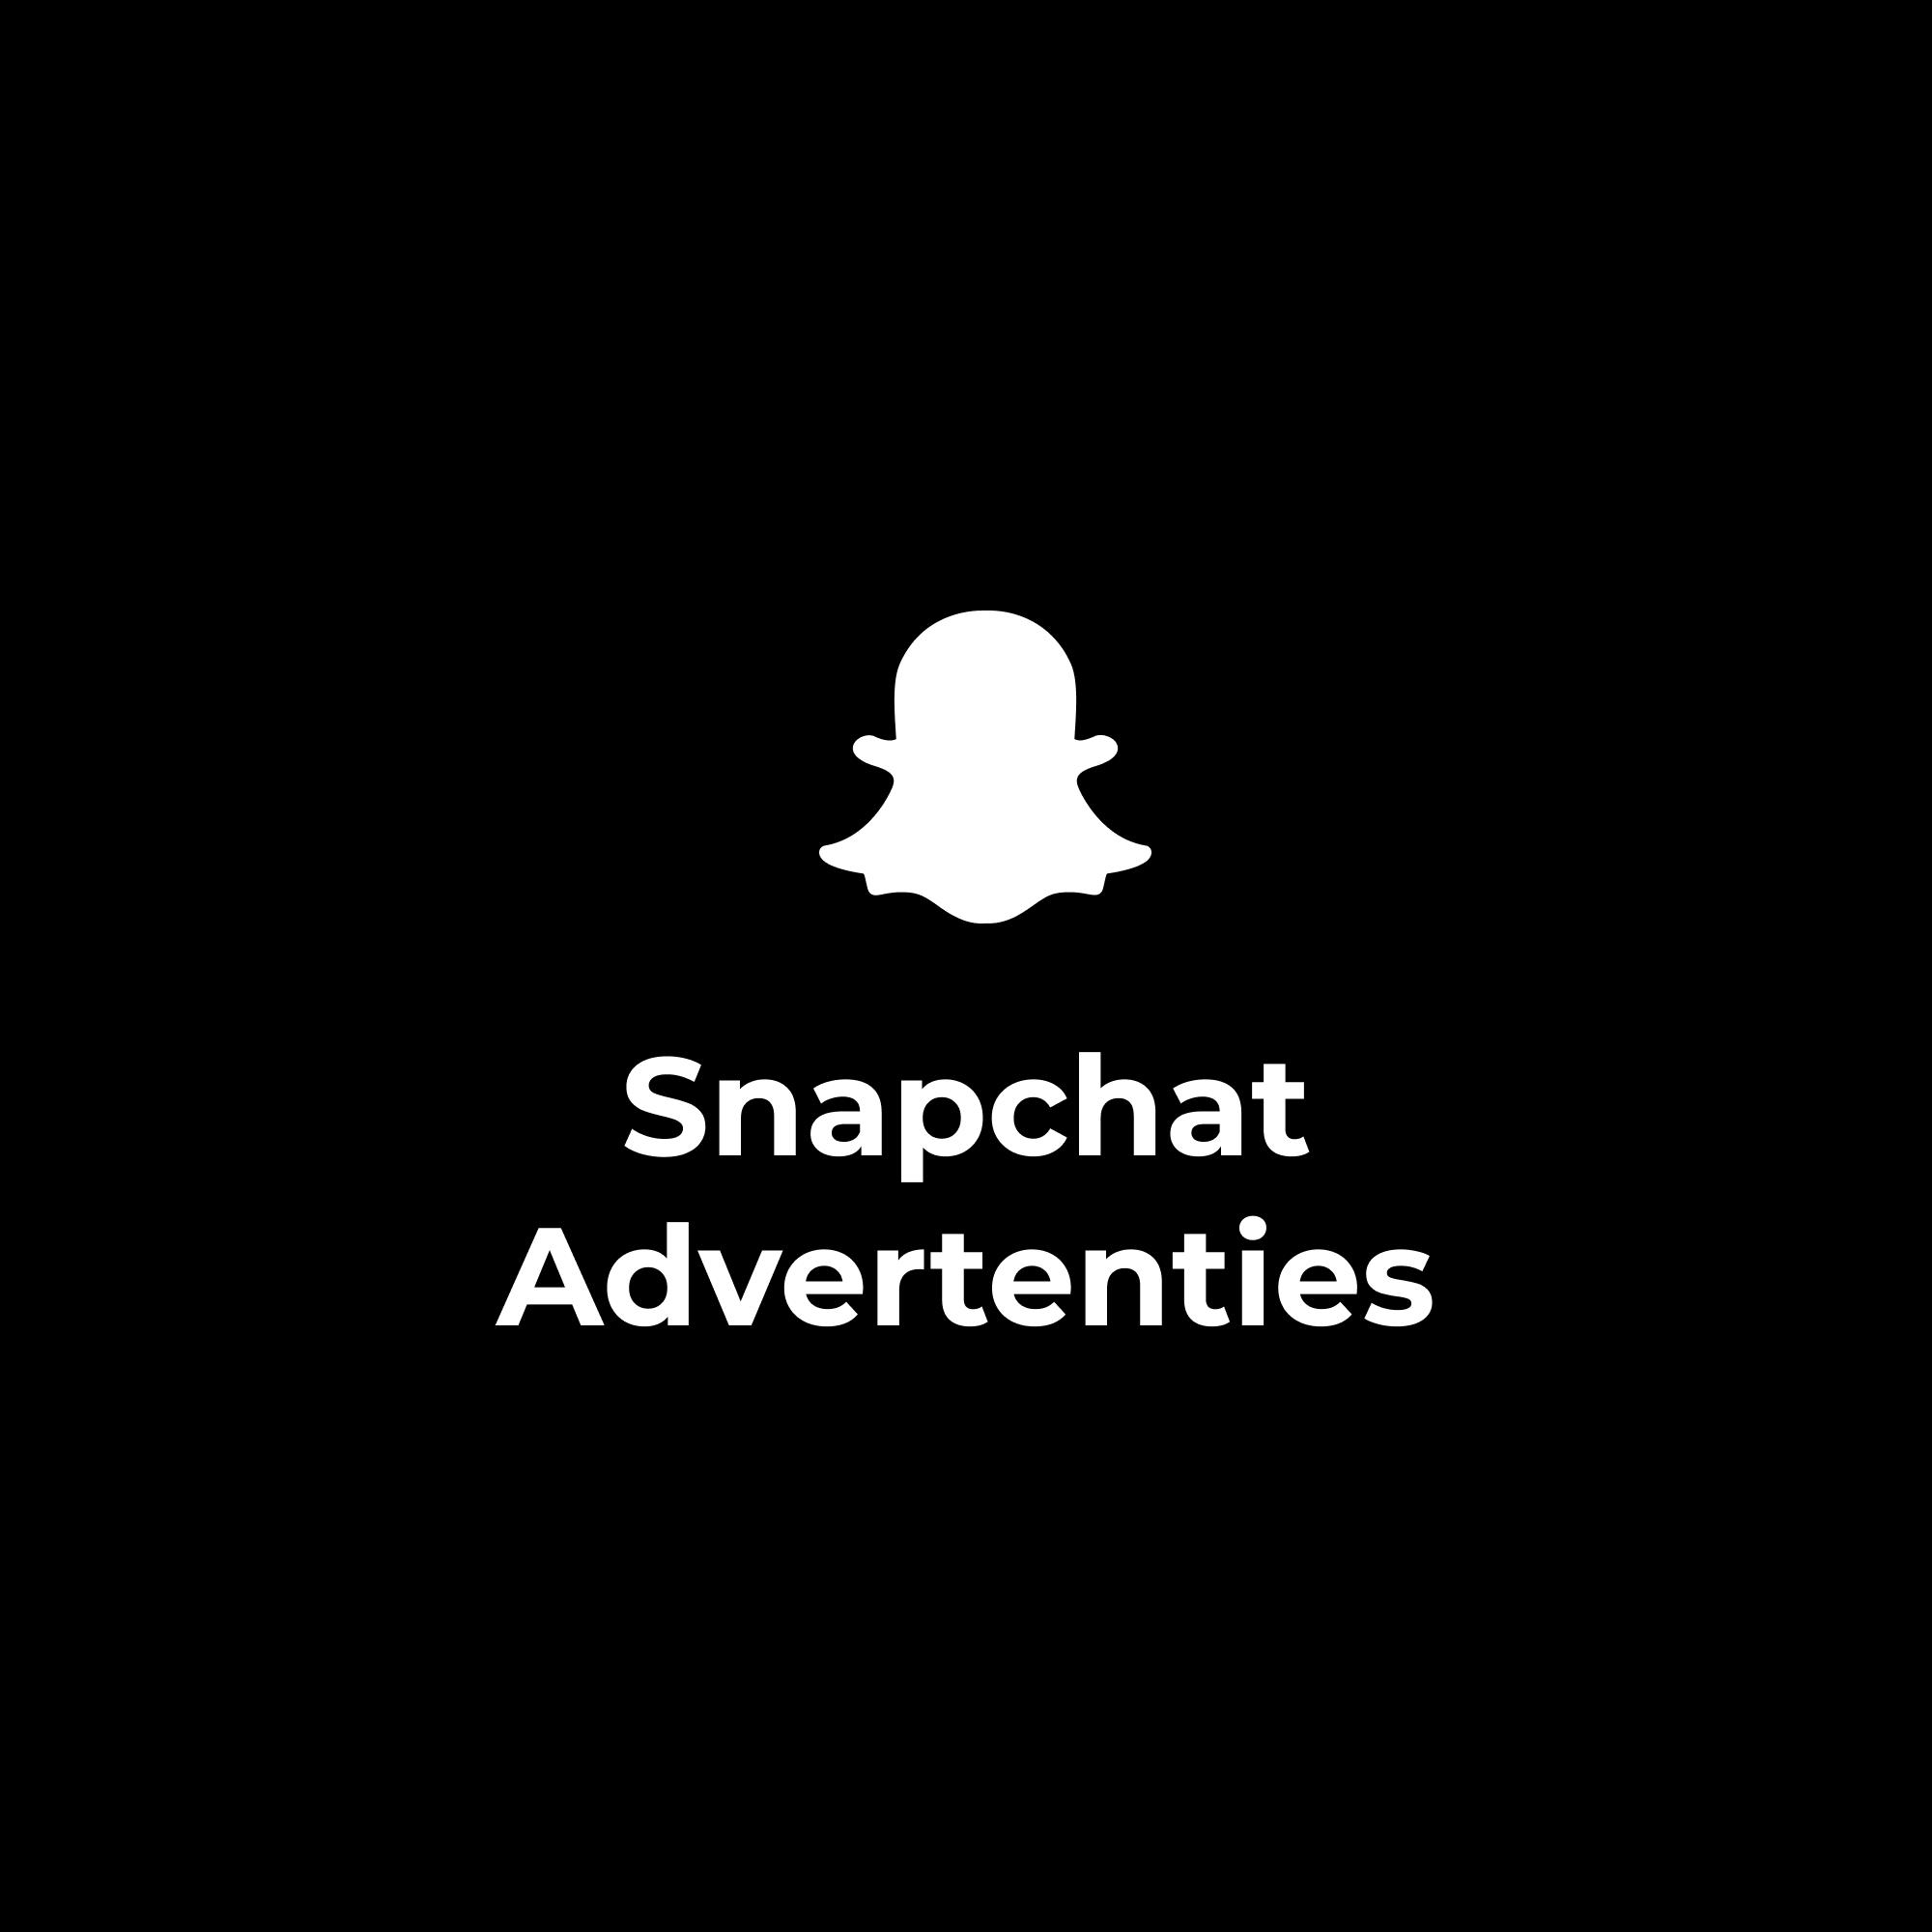 Snapchat Advertenties